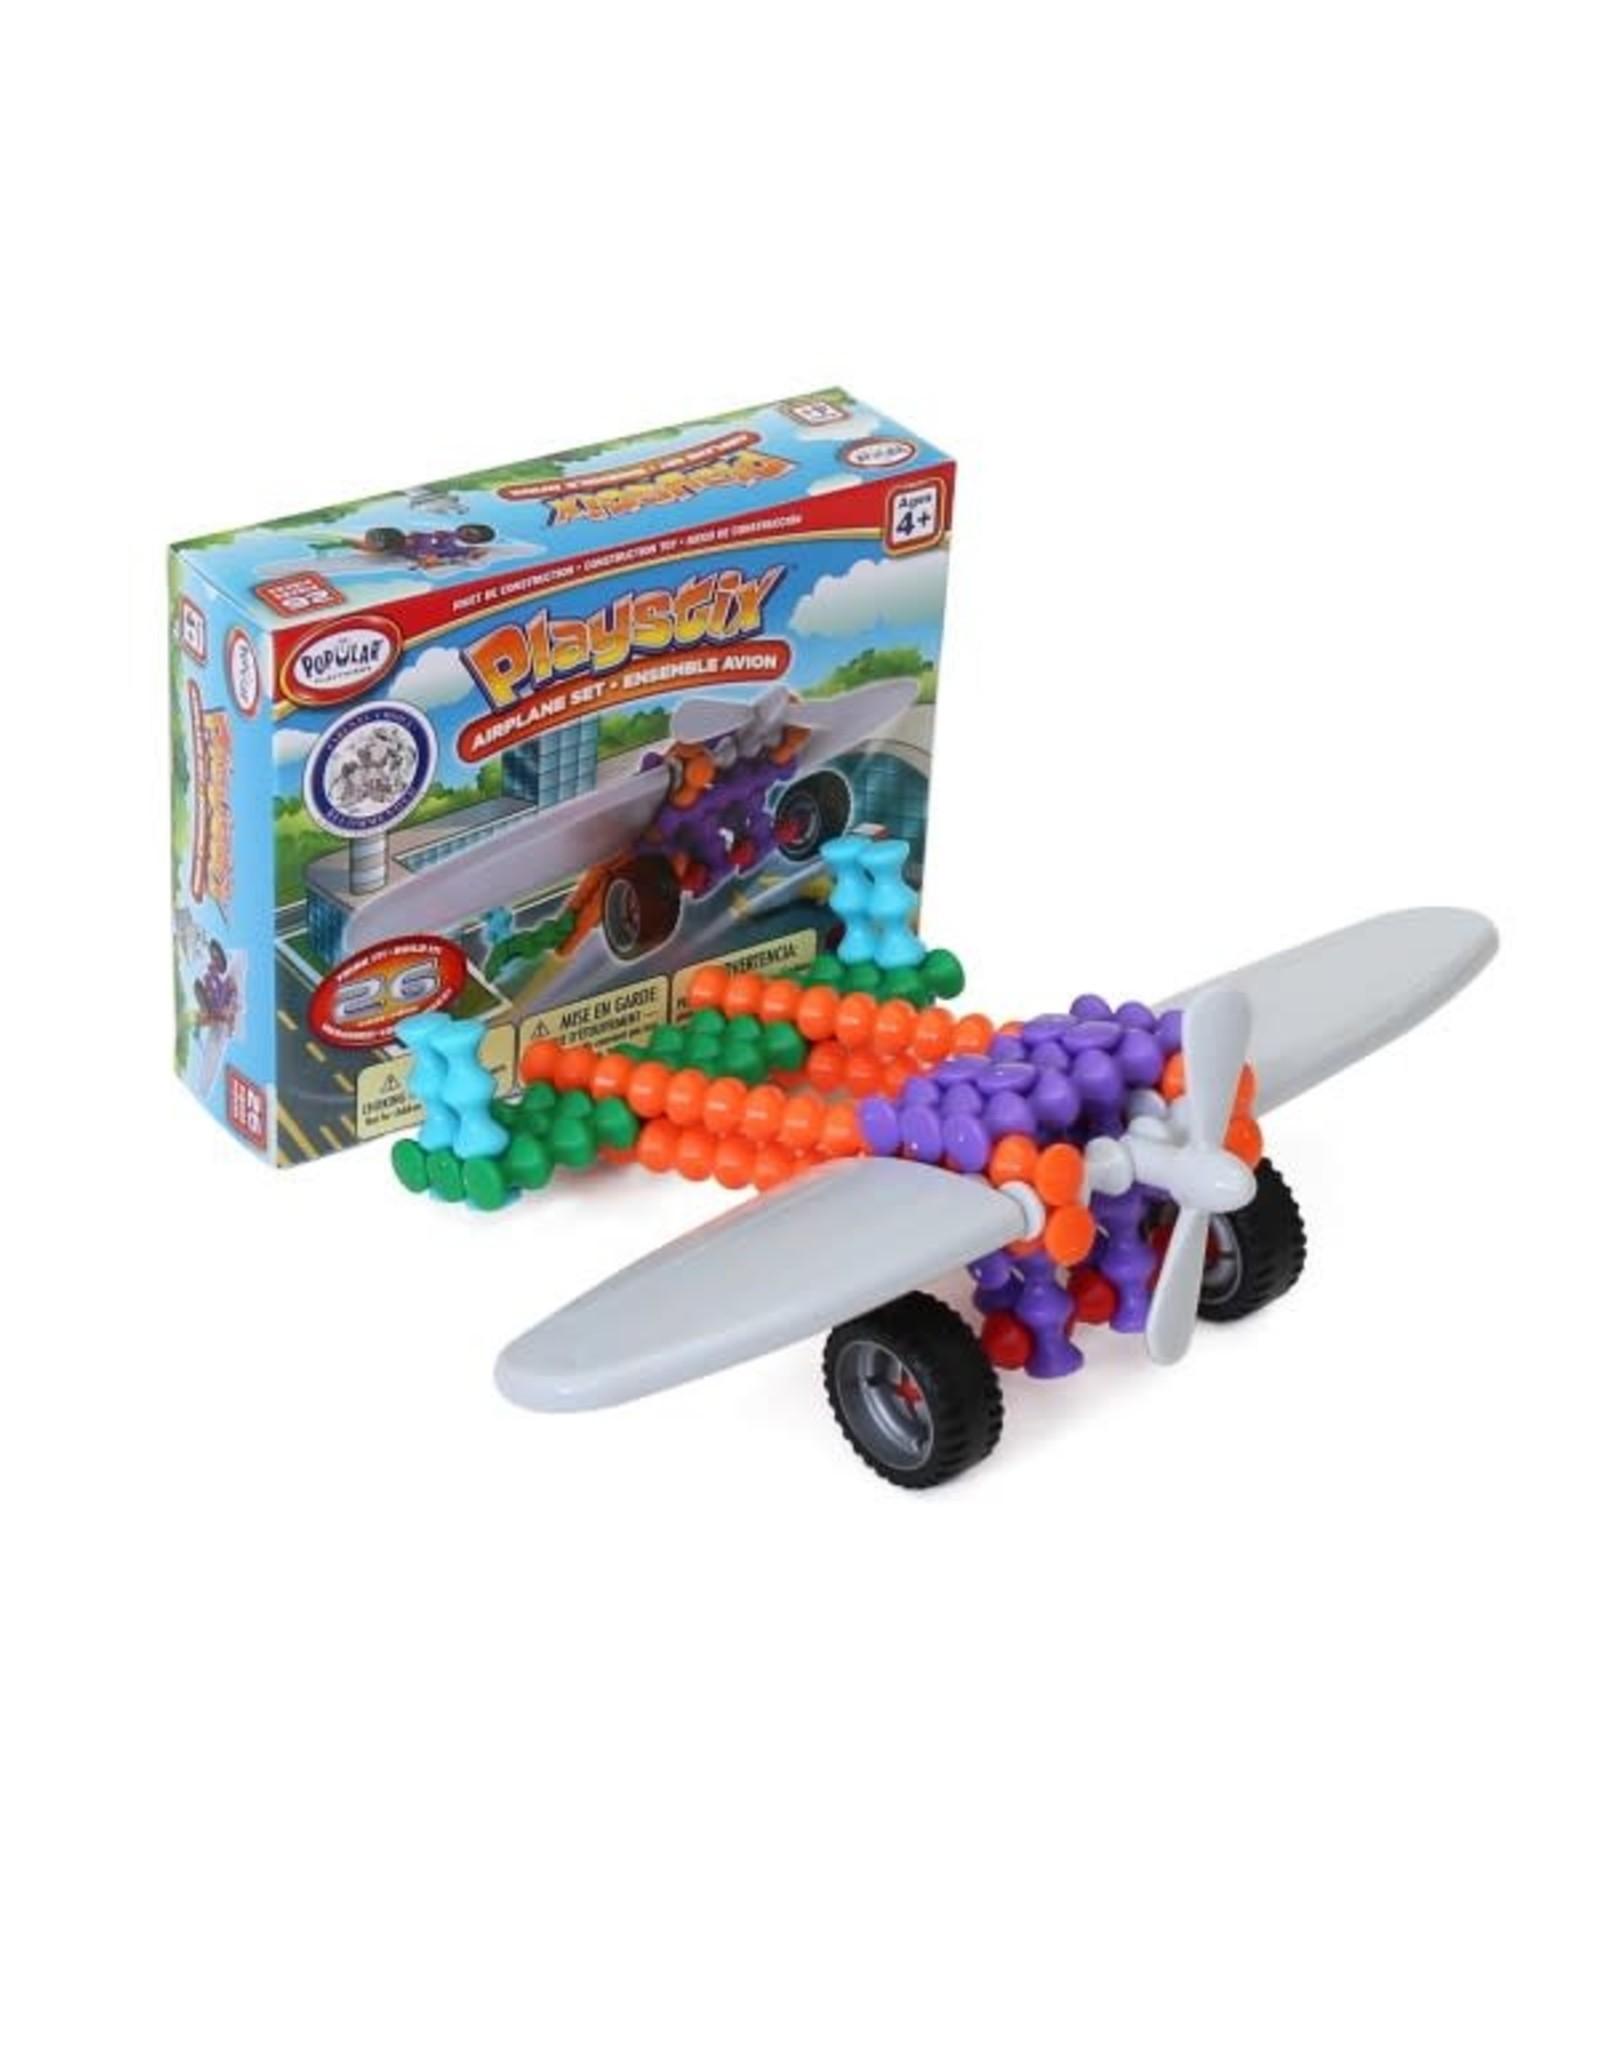 Popular Playthings Playstix Airplane Set